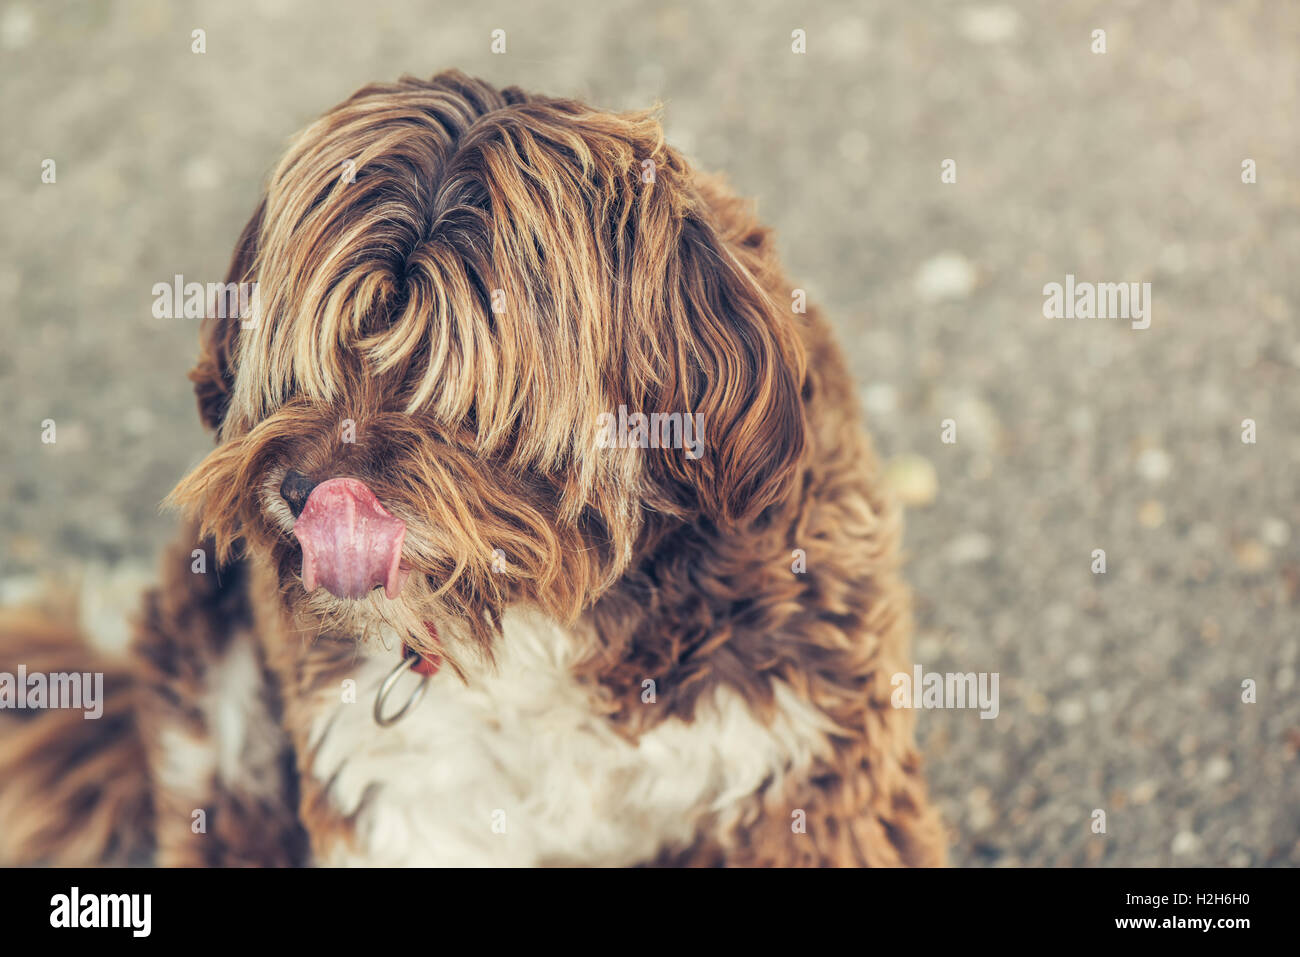 Lhasa Apso perro hembra antiguo retrato exterior Foto de stock